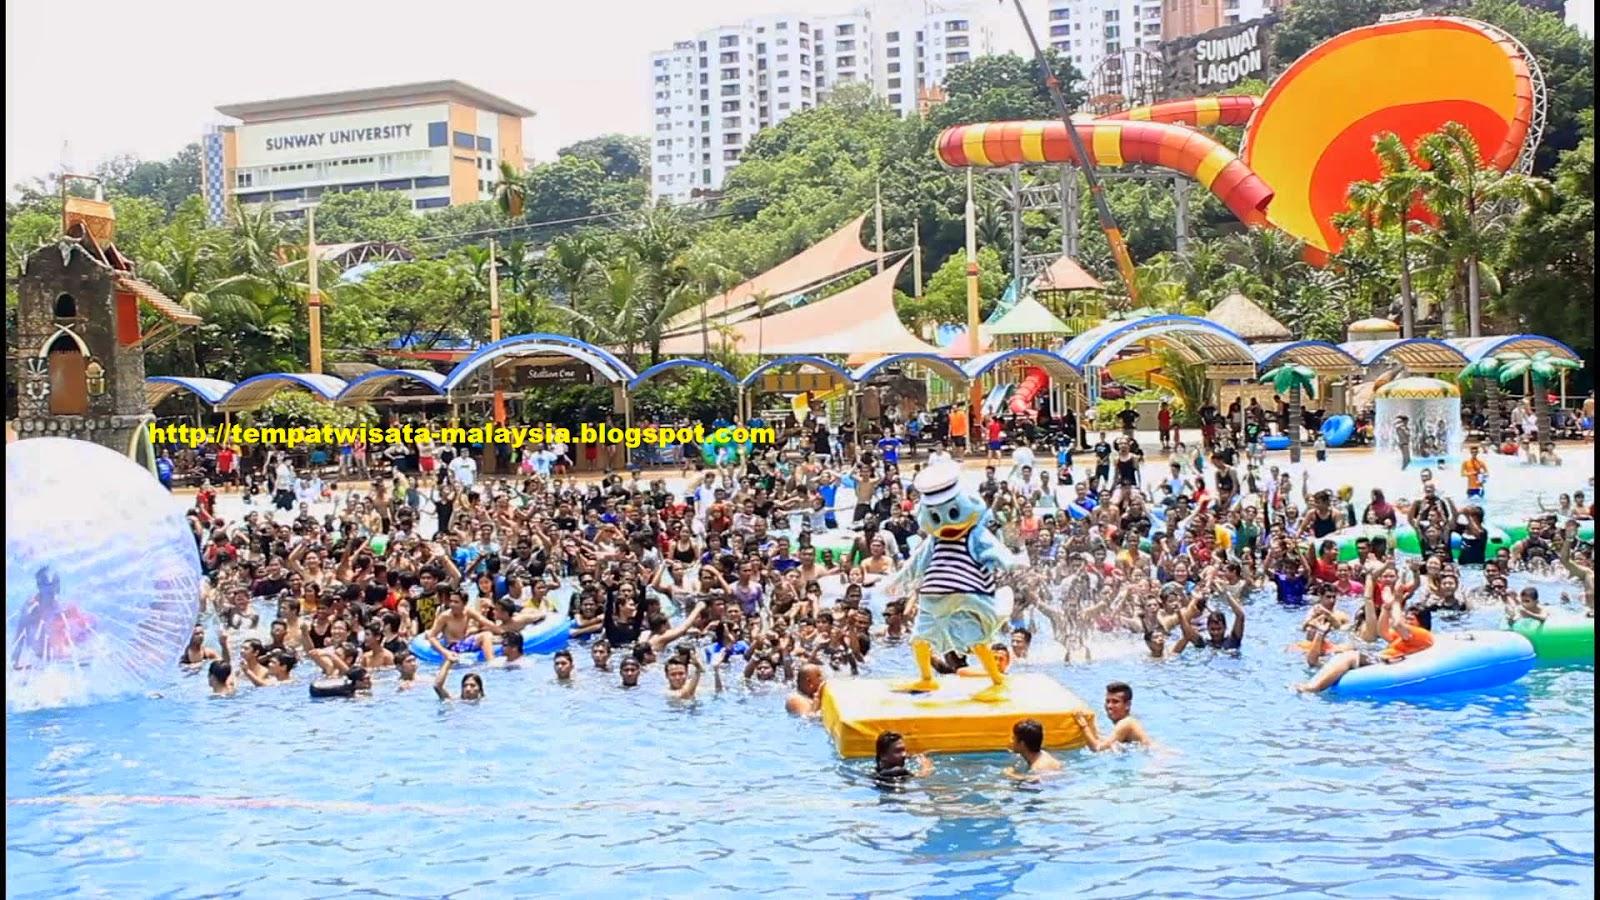 Gambar Water Park Wisata Di Sunway Lagoon Malaysia